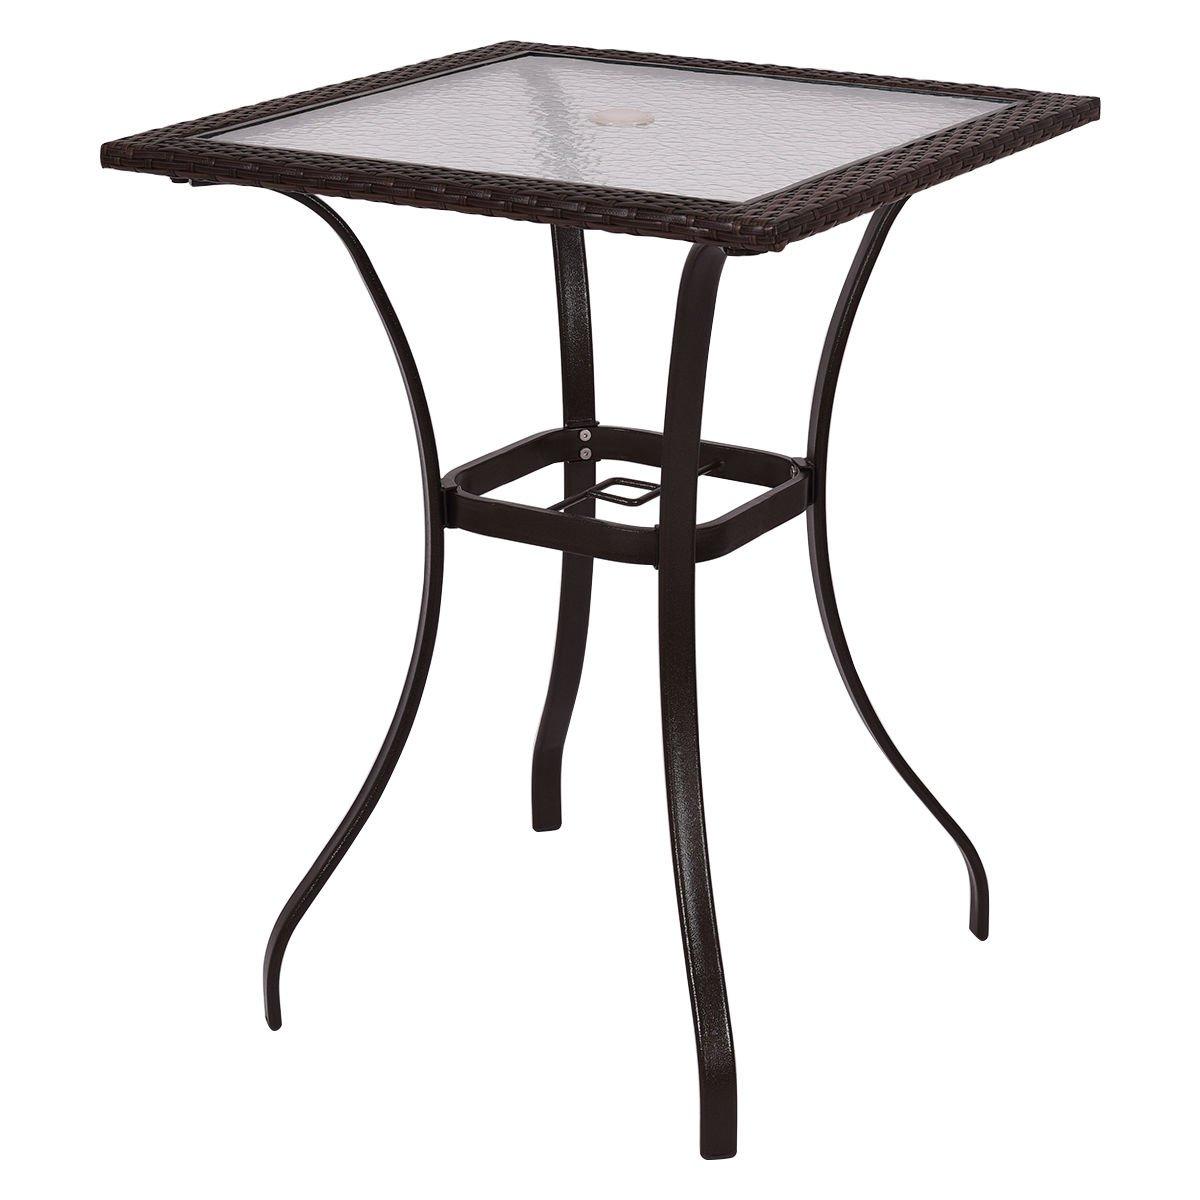 Good concept Wicker Bar Square Table Glass Outdoor Patio Rattan Furniture Top Yard Garden